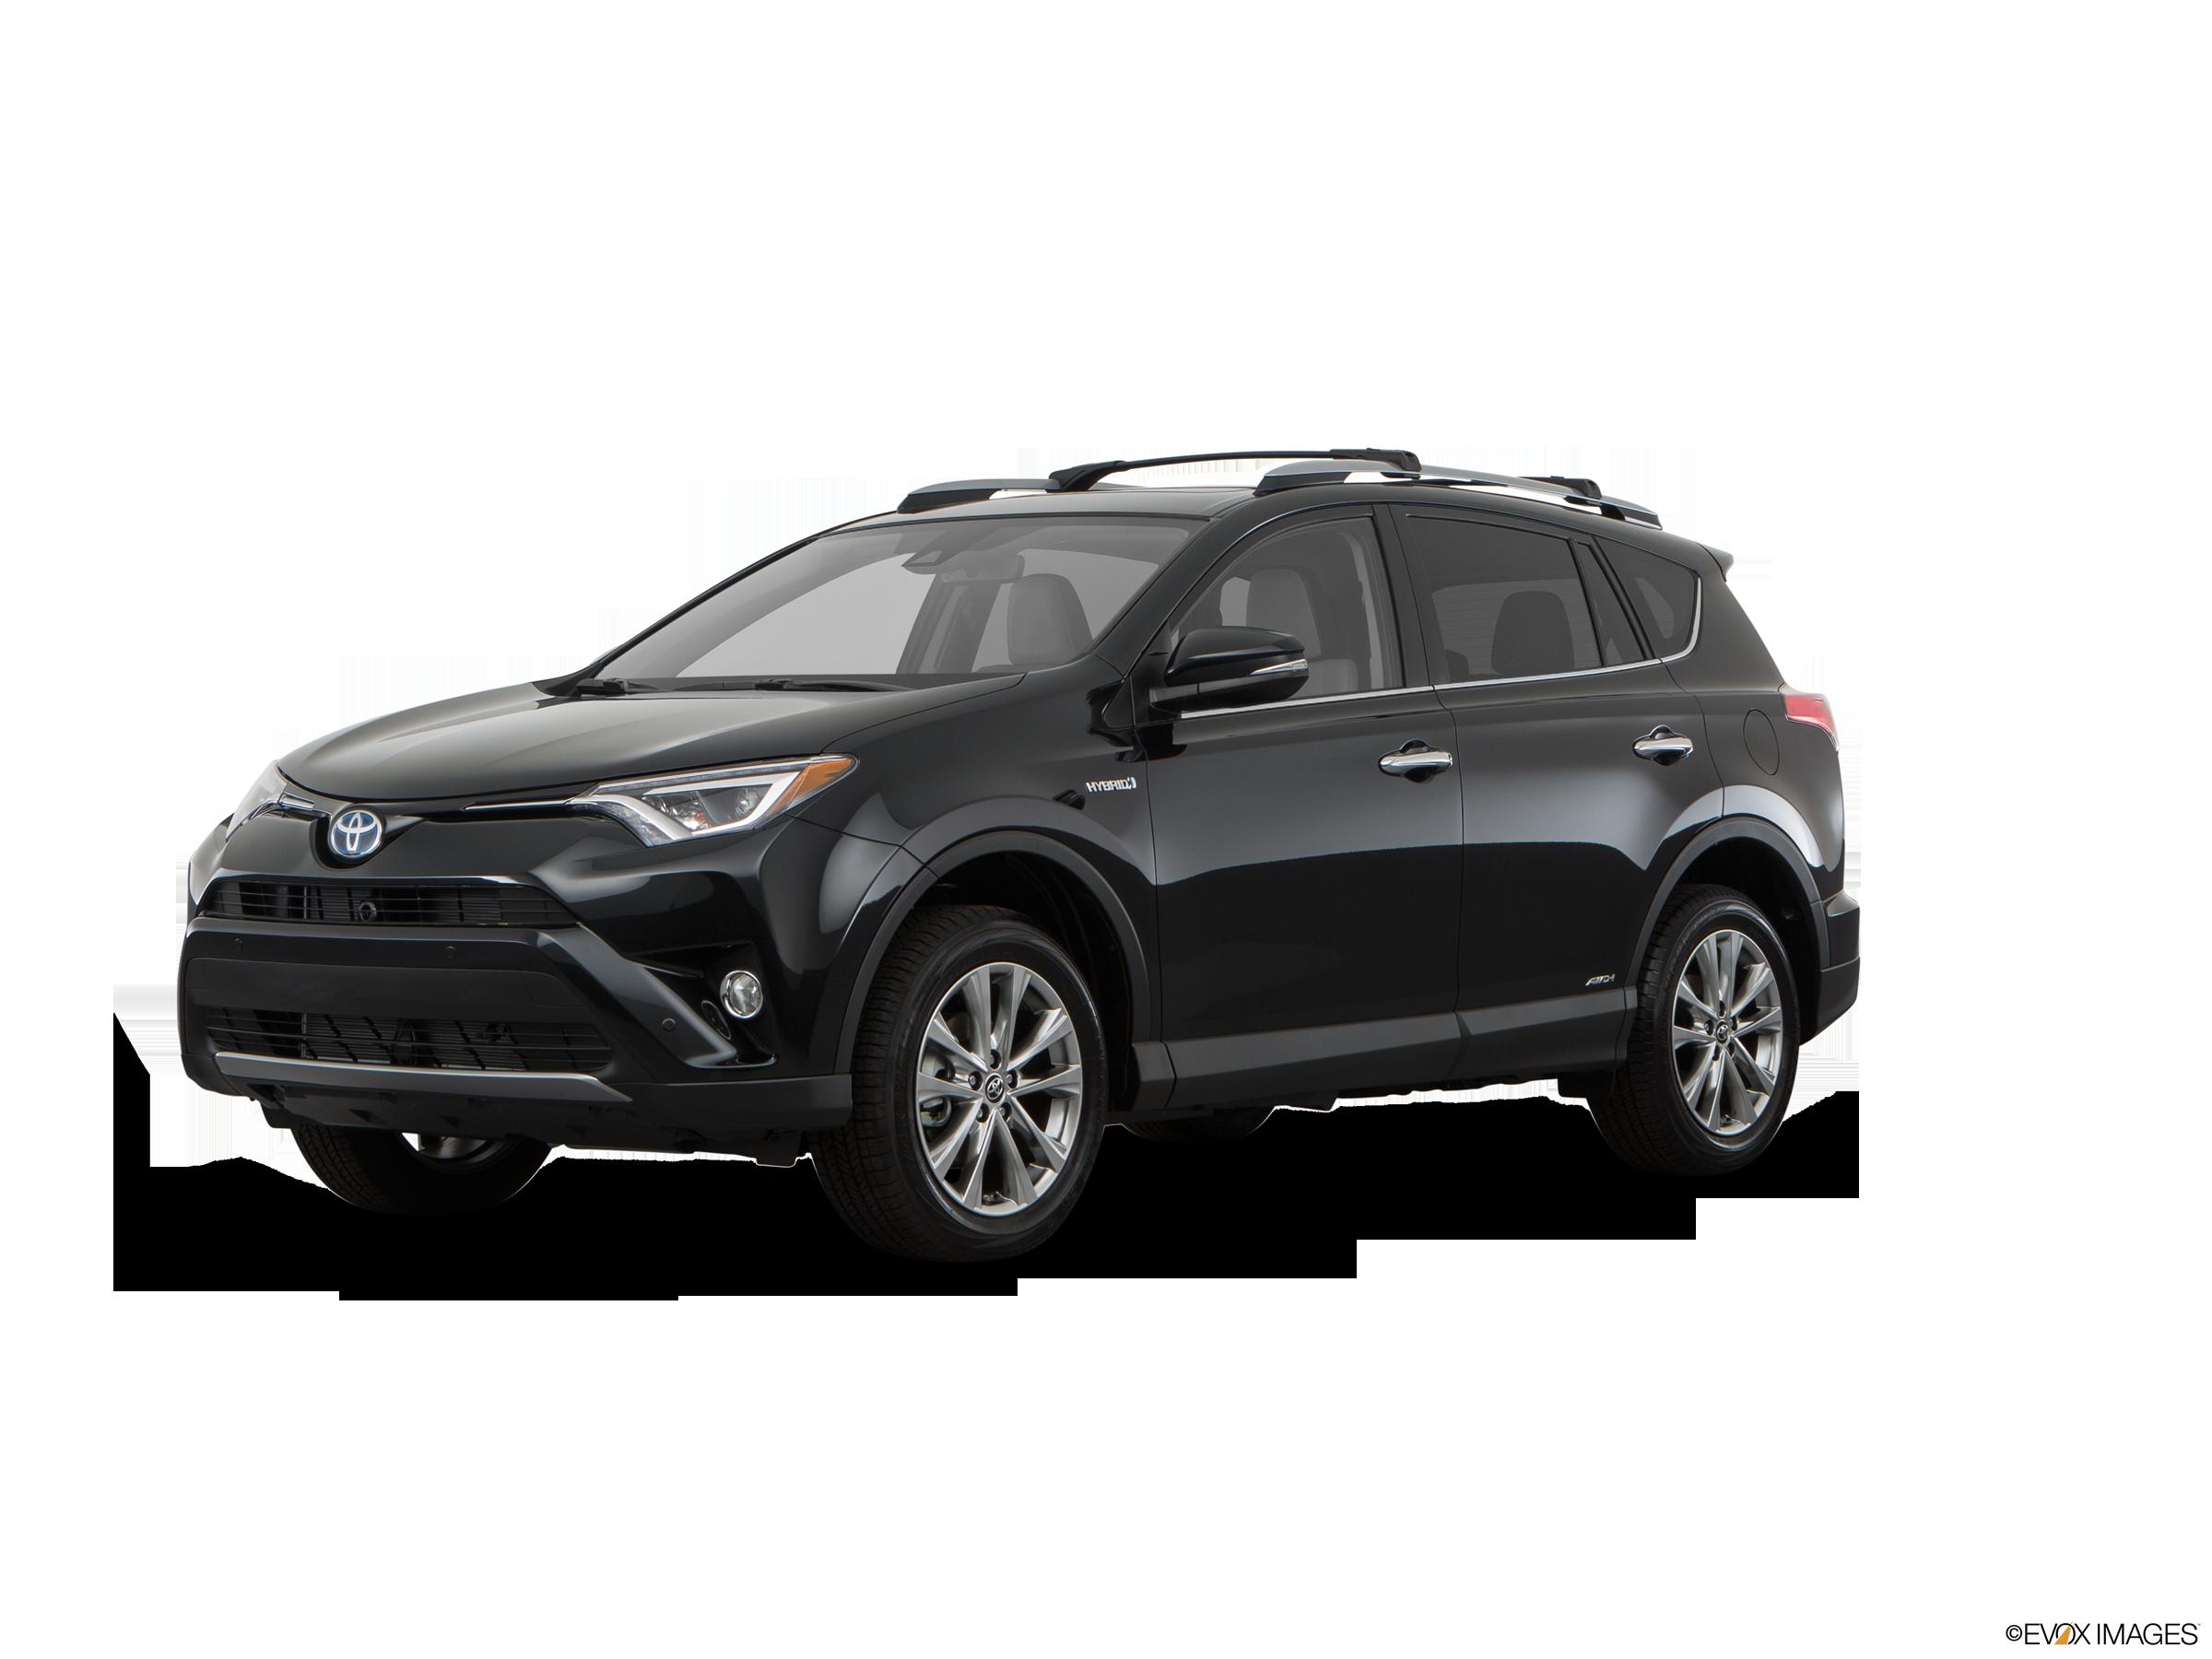 Kelebihan Toyota 2018 Spesifikasi